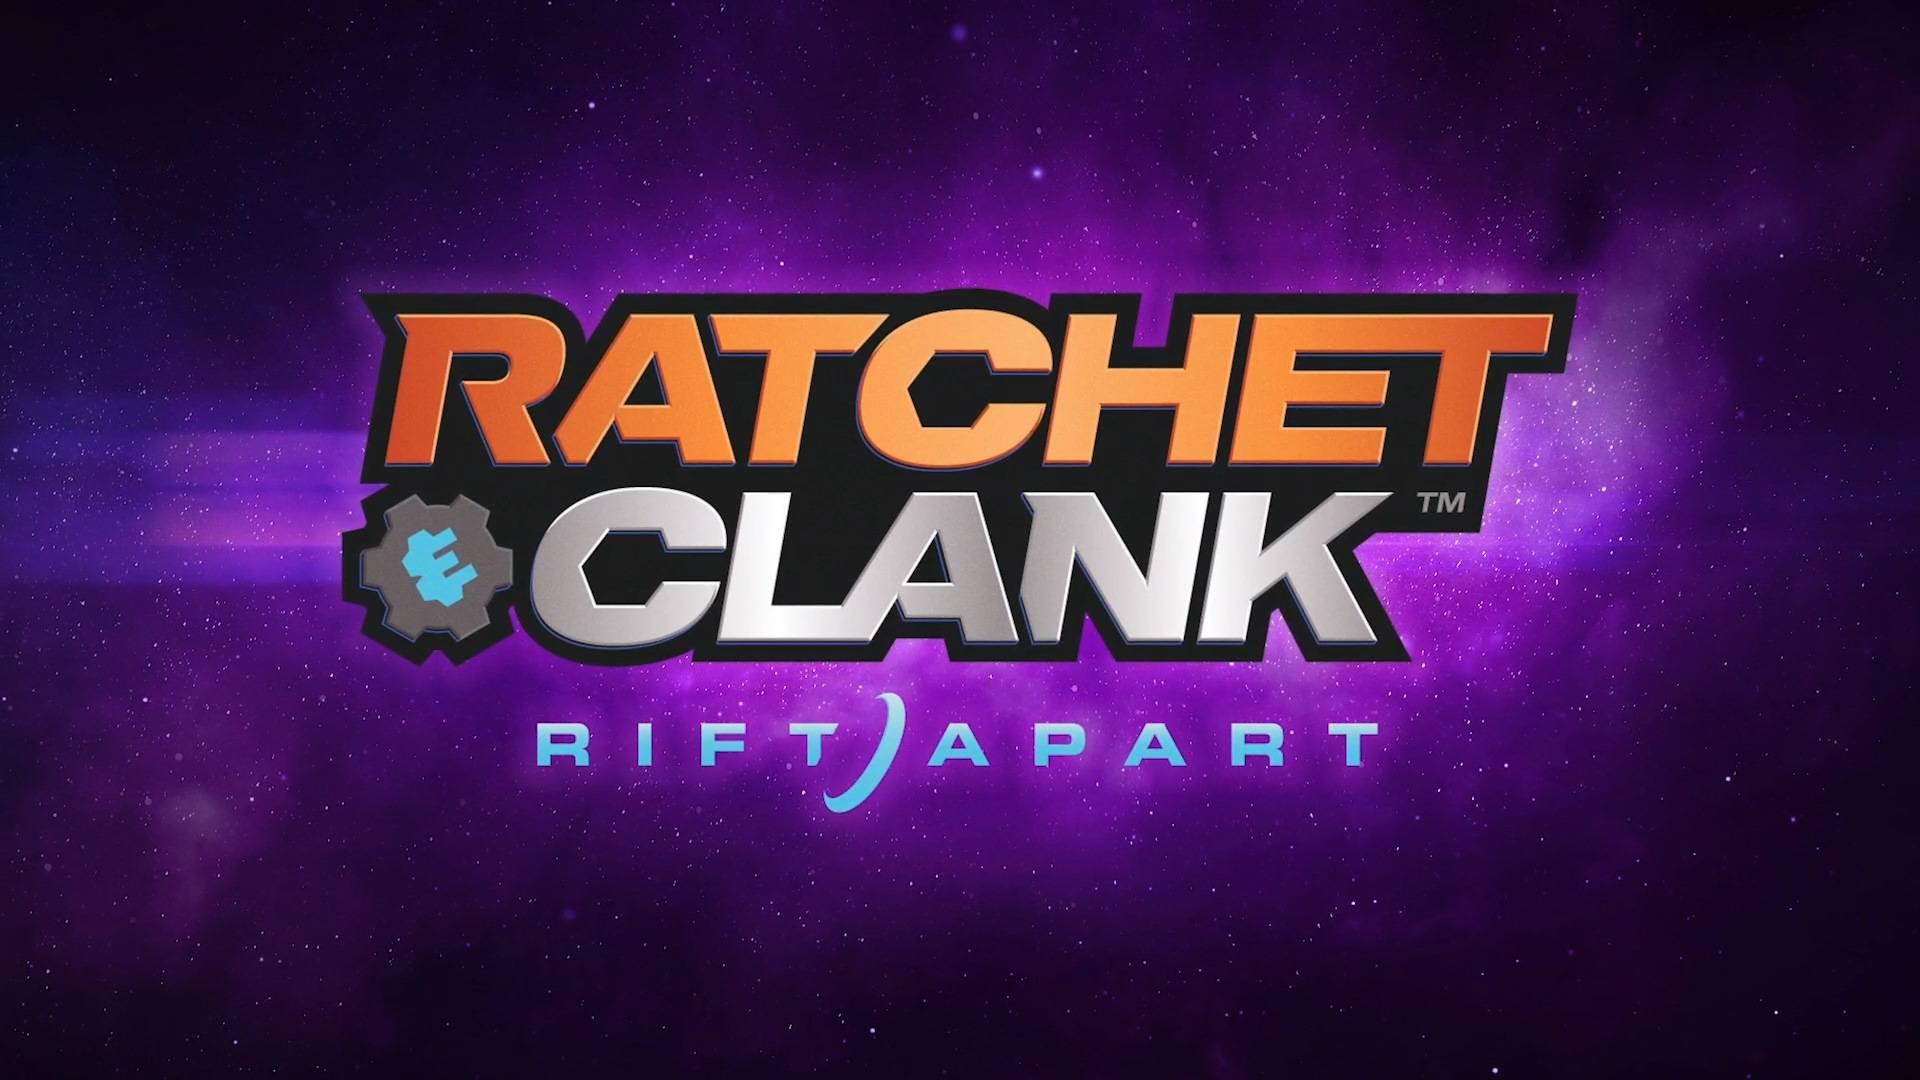 Ratchet e Clank Rift Apart